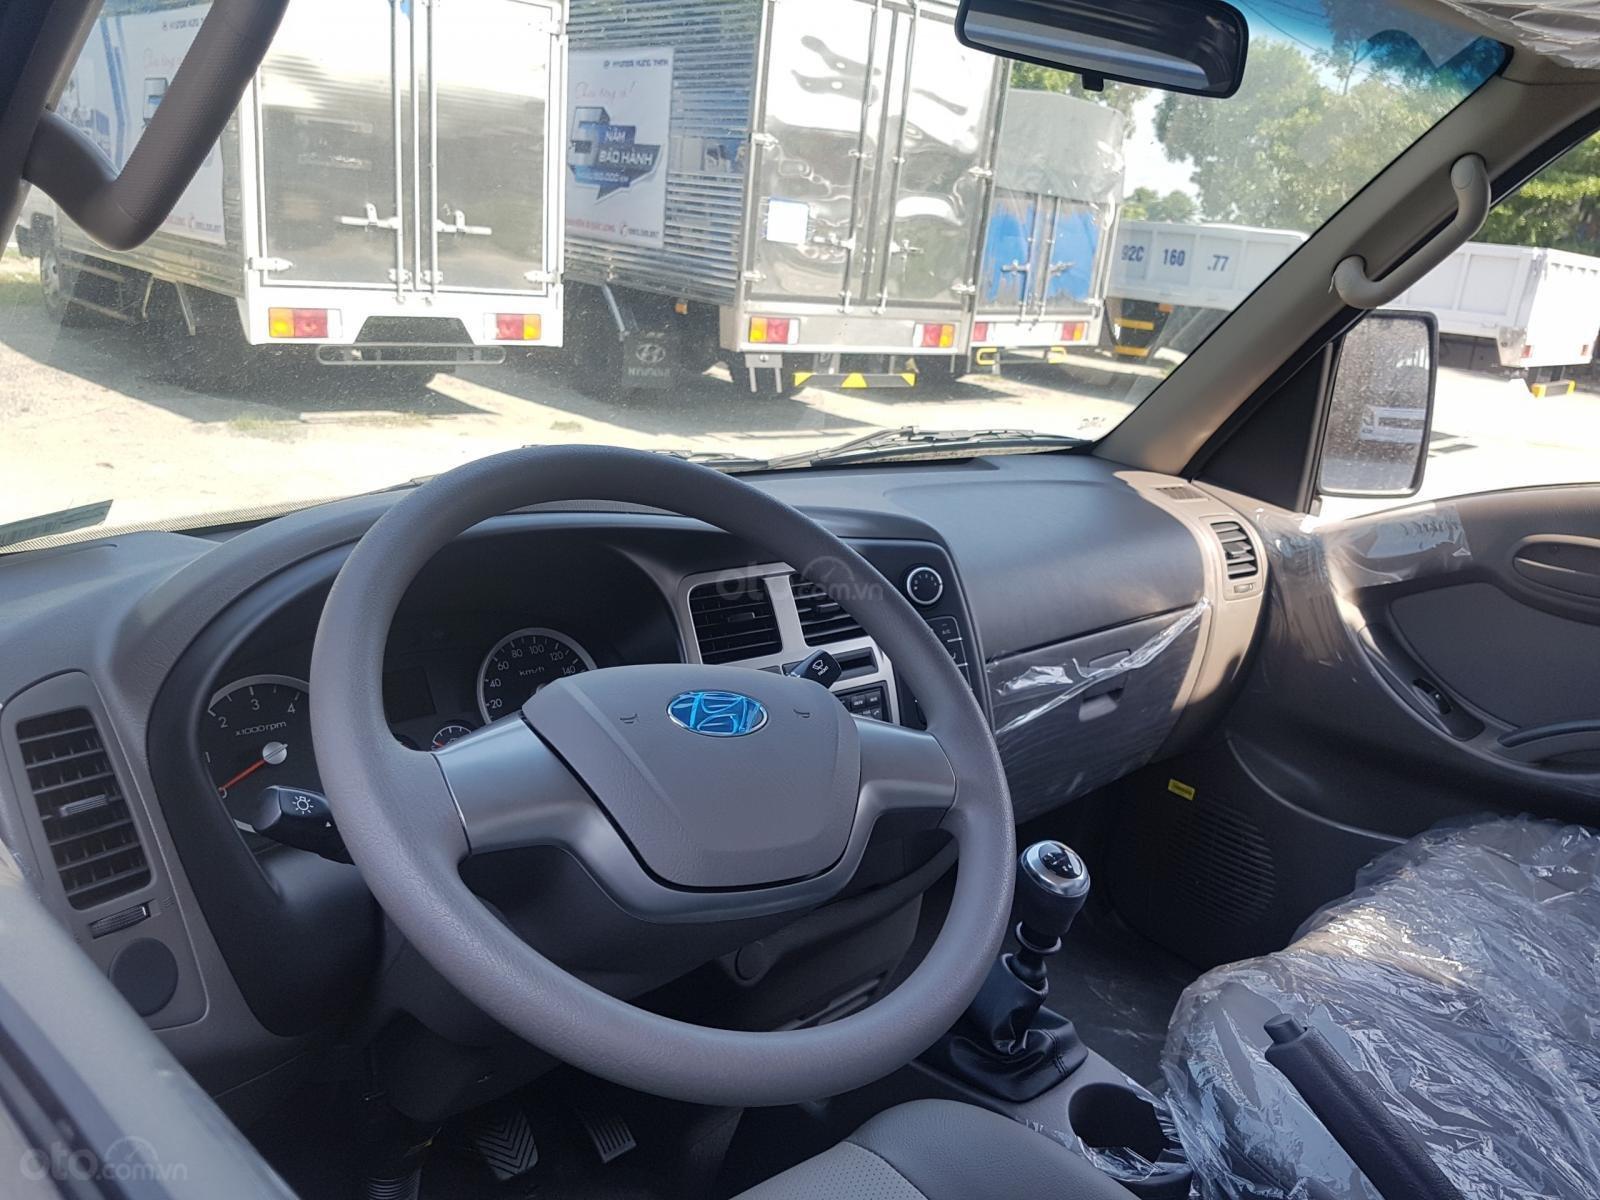 Bán Hyundai Porter 150 đời 2019, giảm giá 5 triệu, tặng 100% bảo hiểm (9)